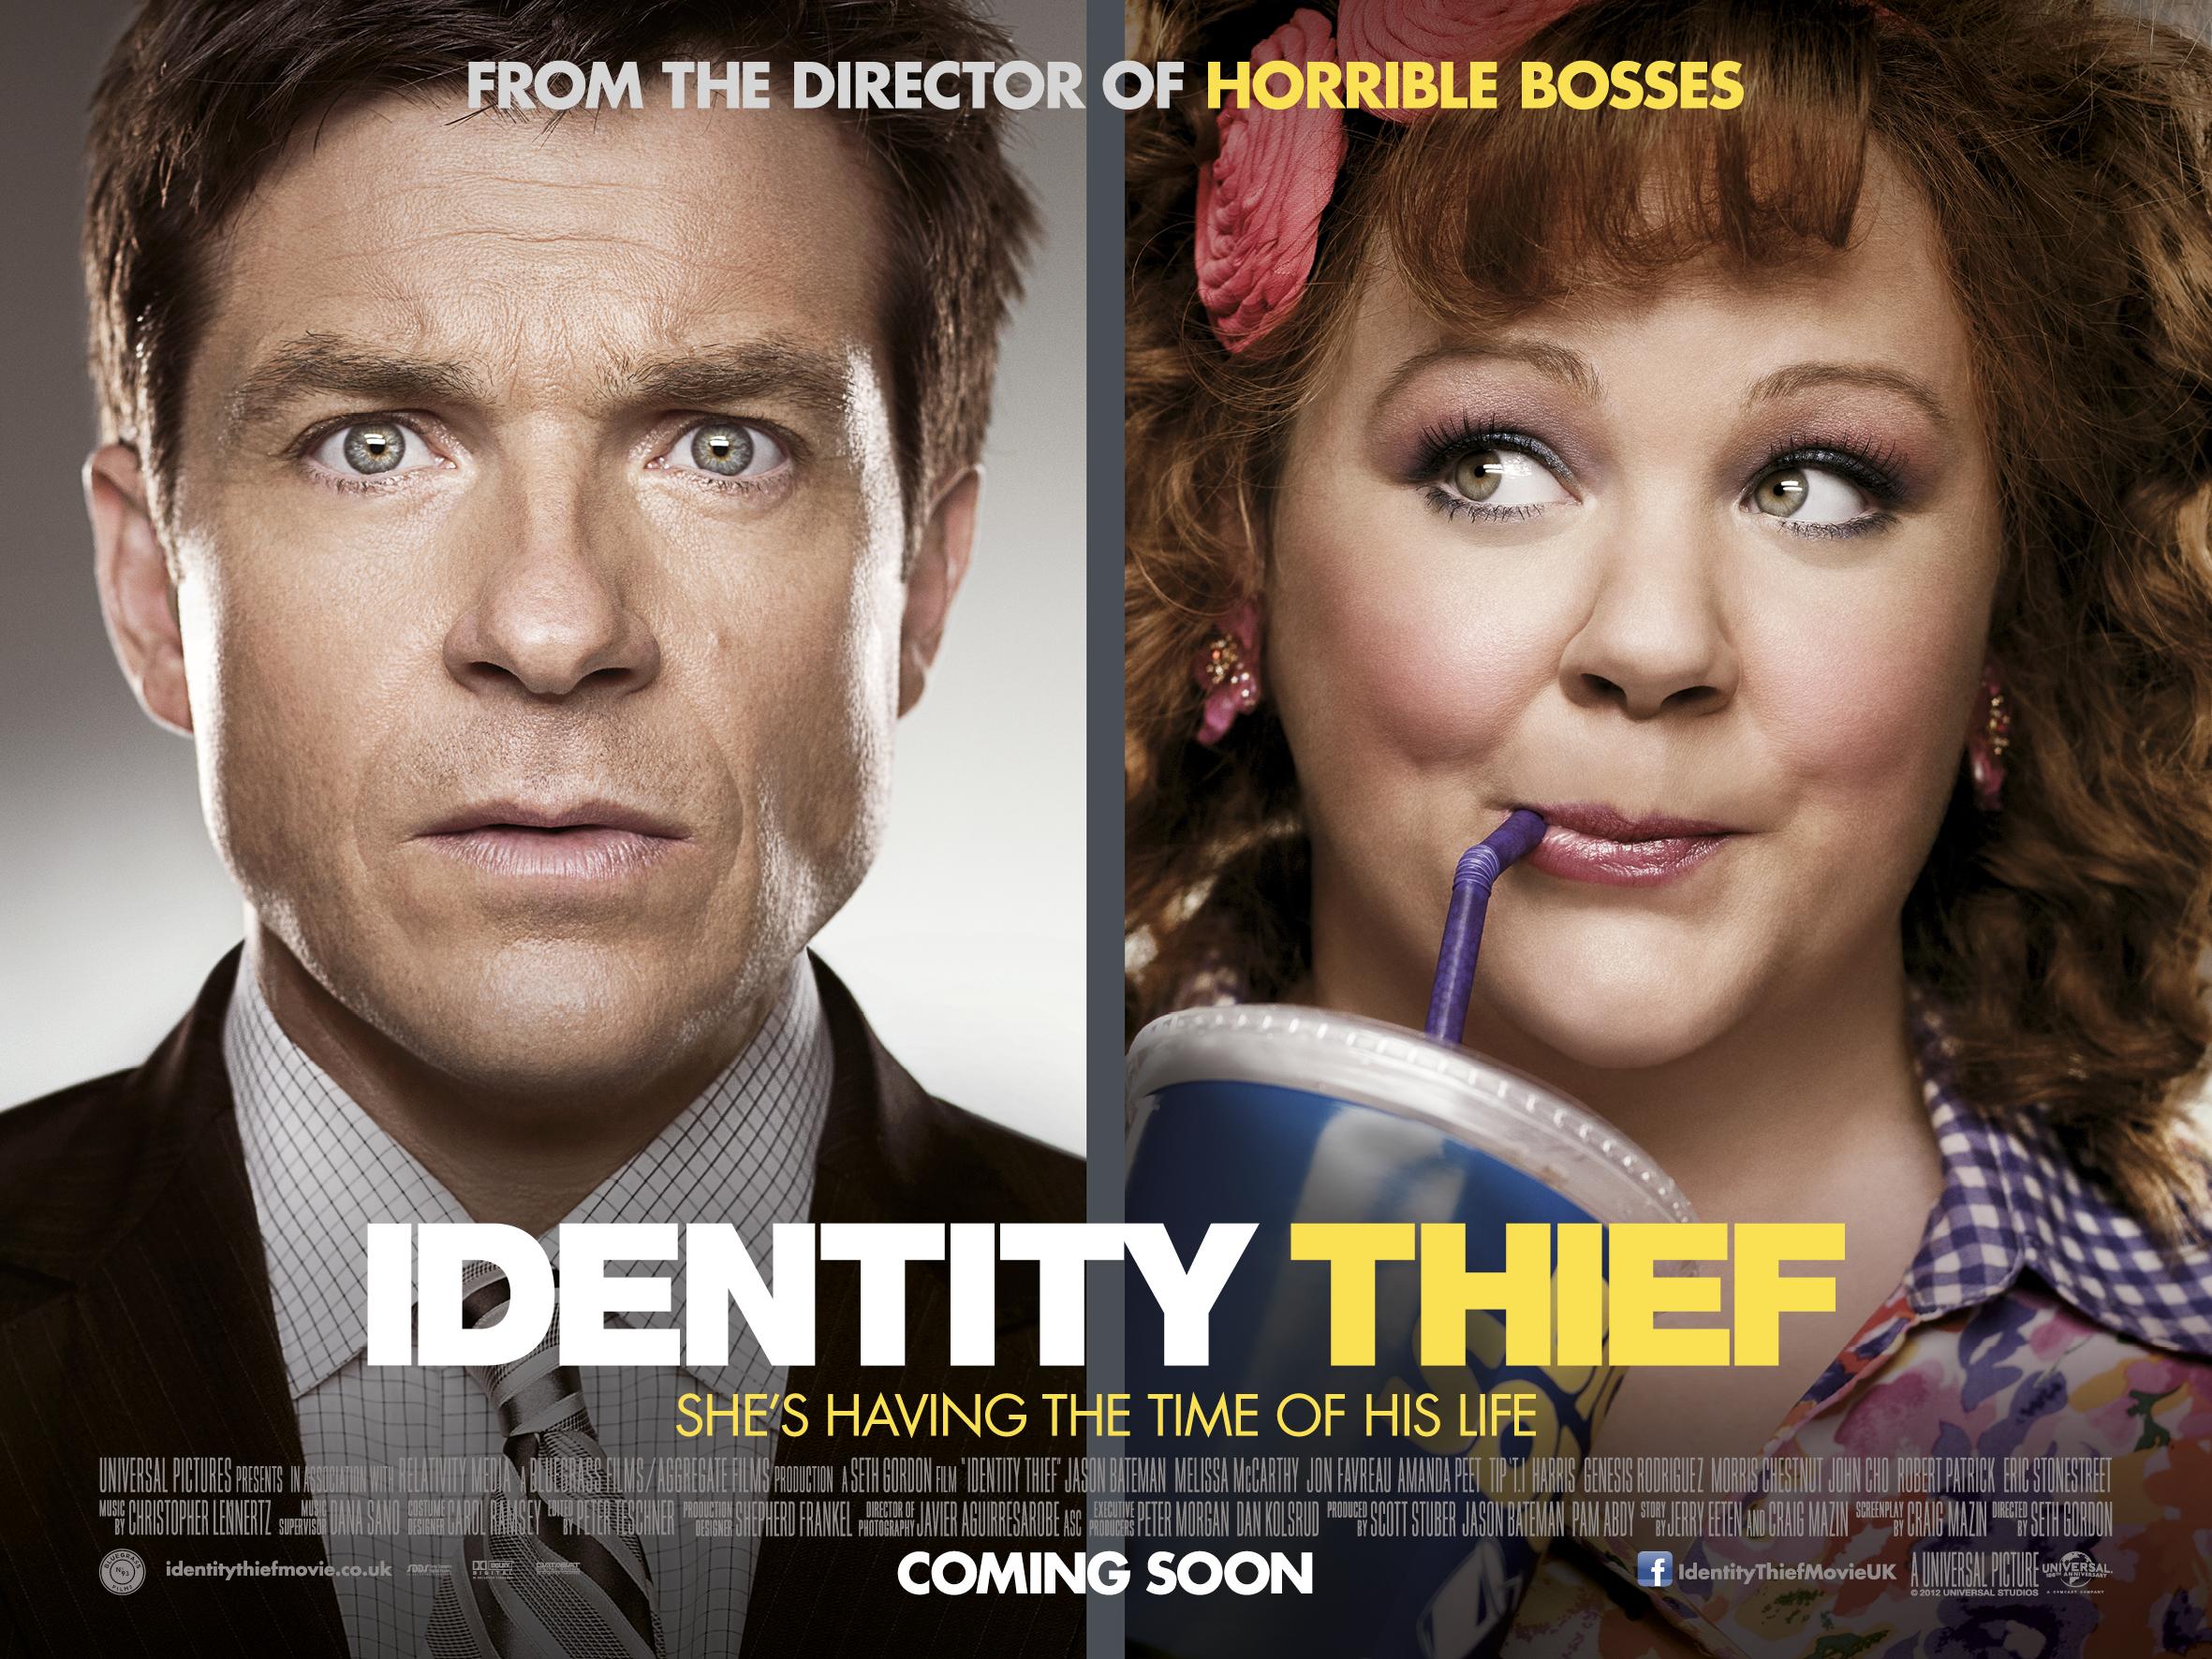 identity thief movie quotes - photo #23